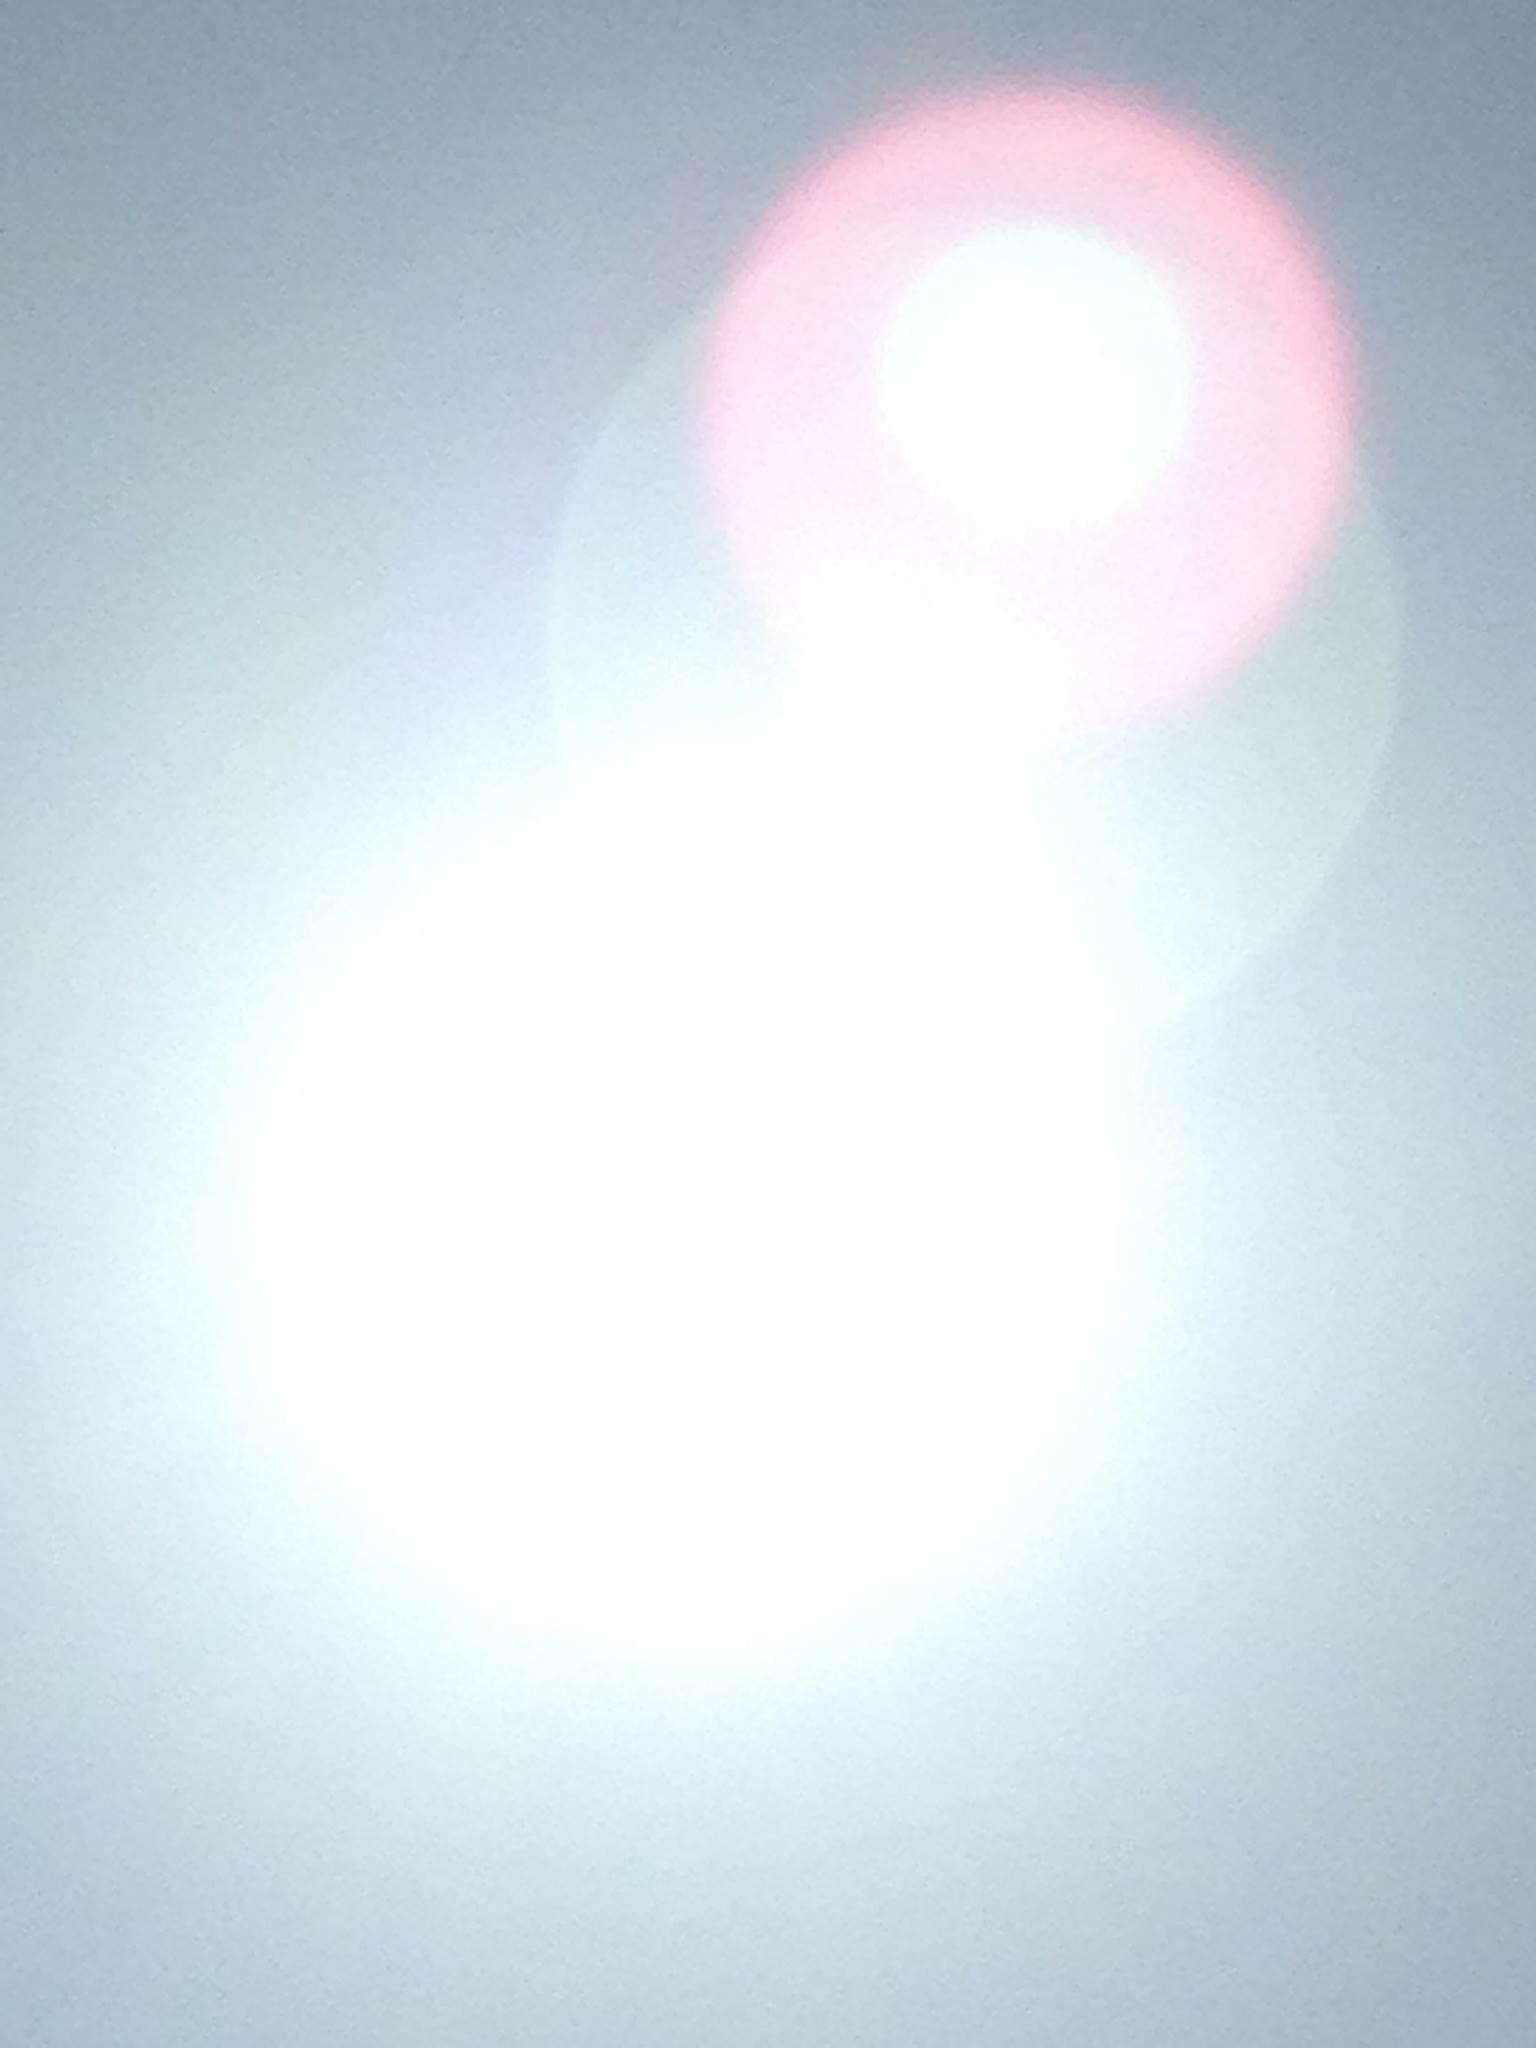 c0180209_18174606.jpg